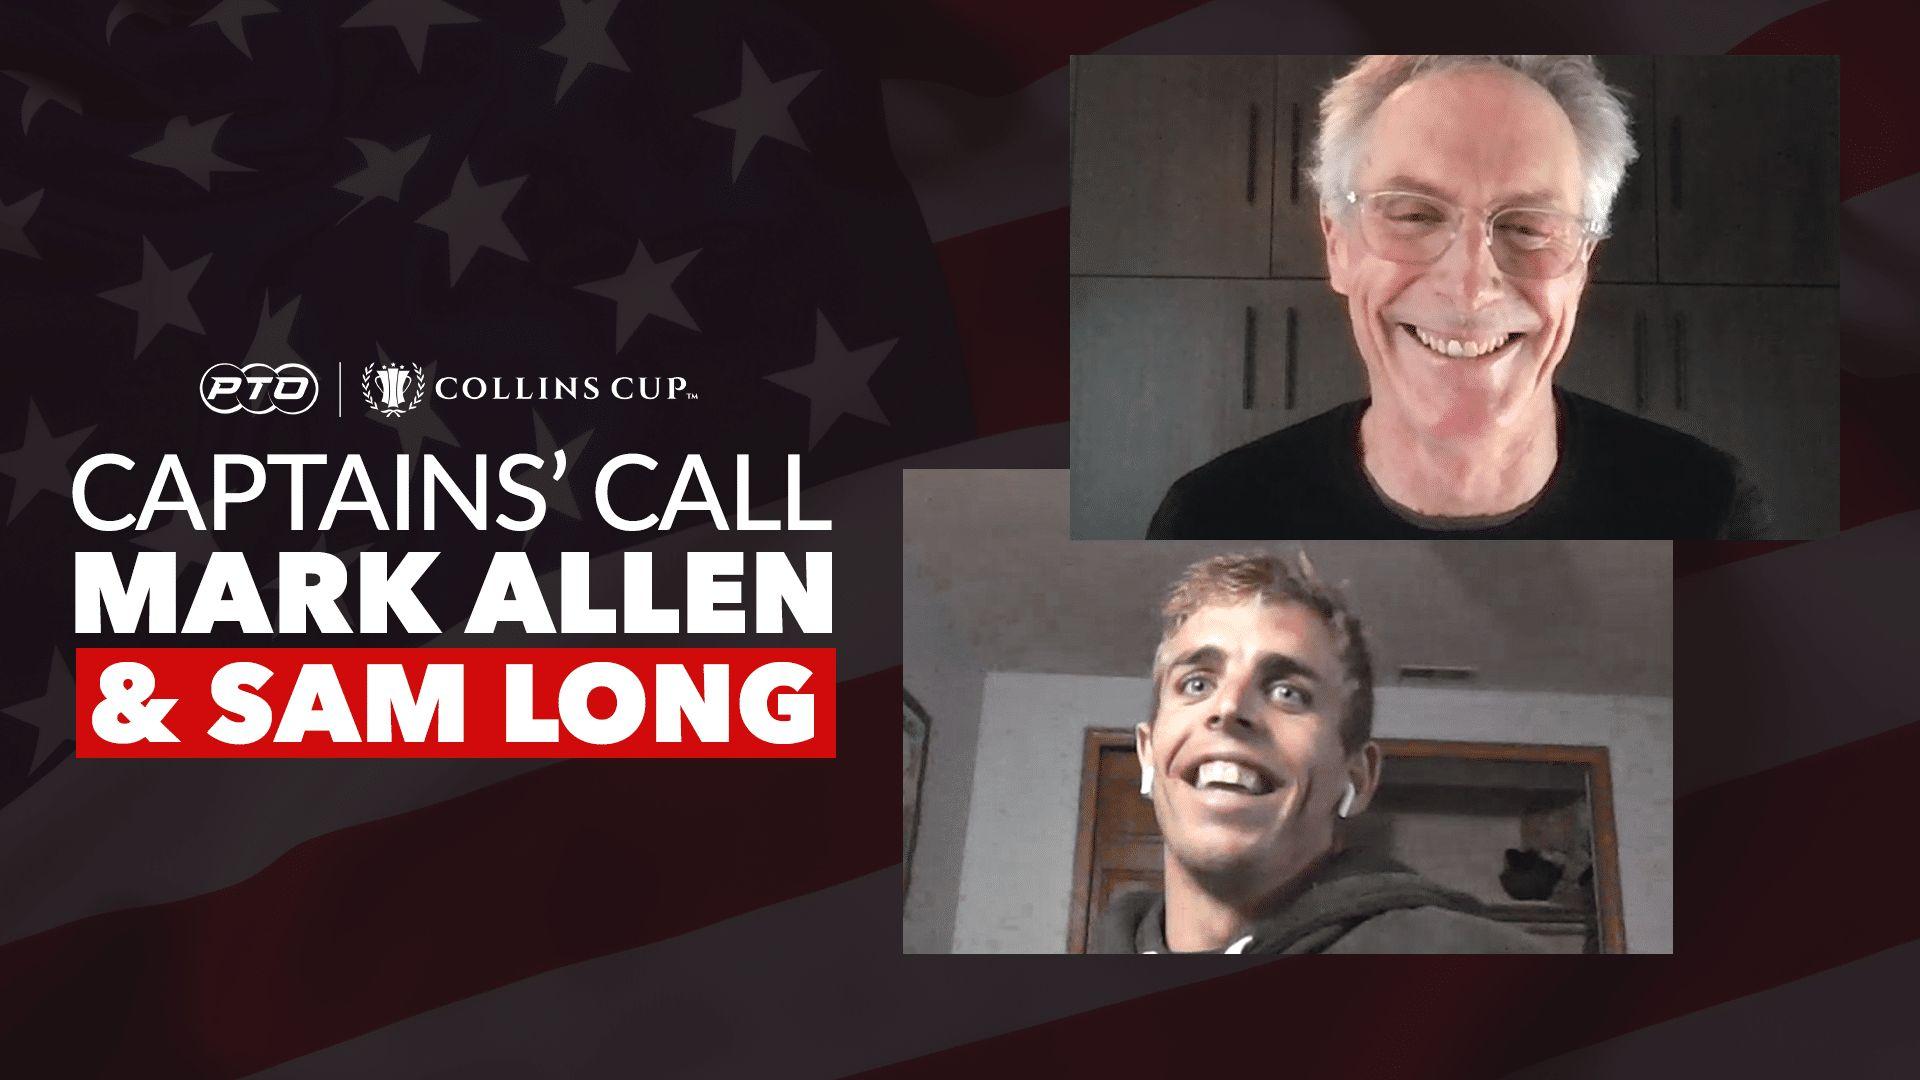 Captains' Call: Team USA - Mark Allen & Sam Long | Collins Cup